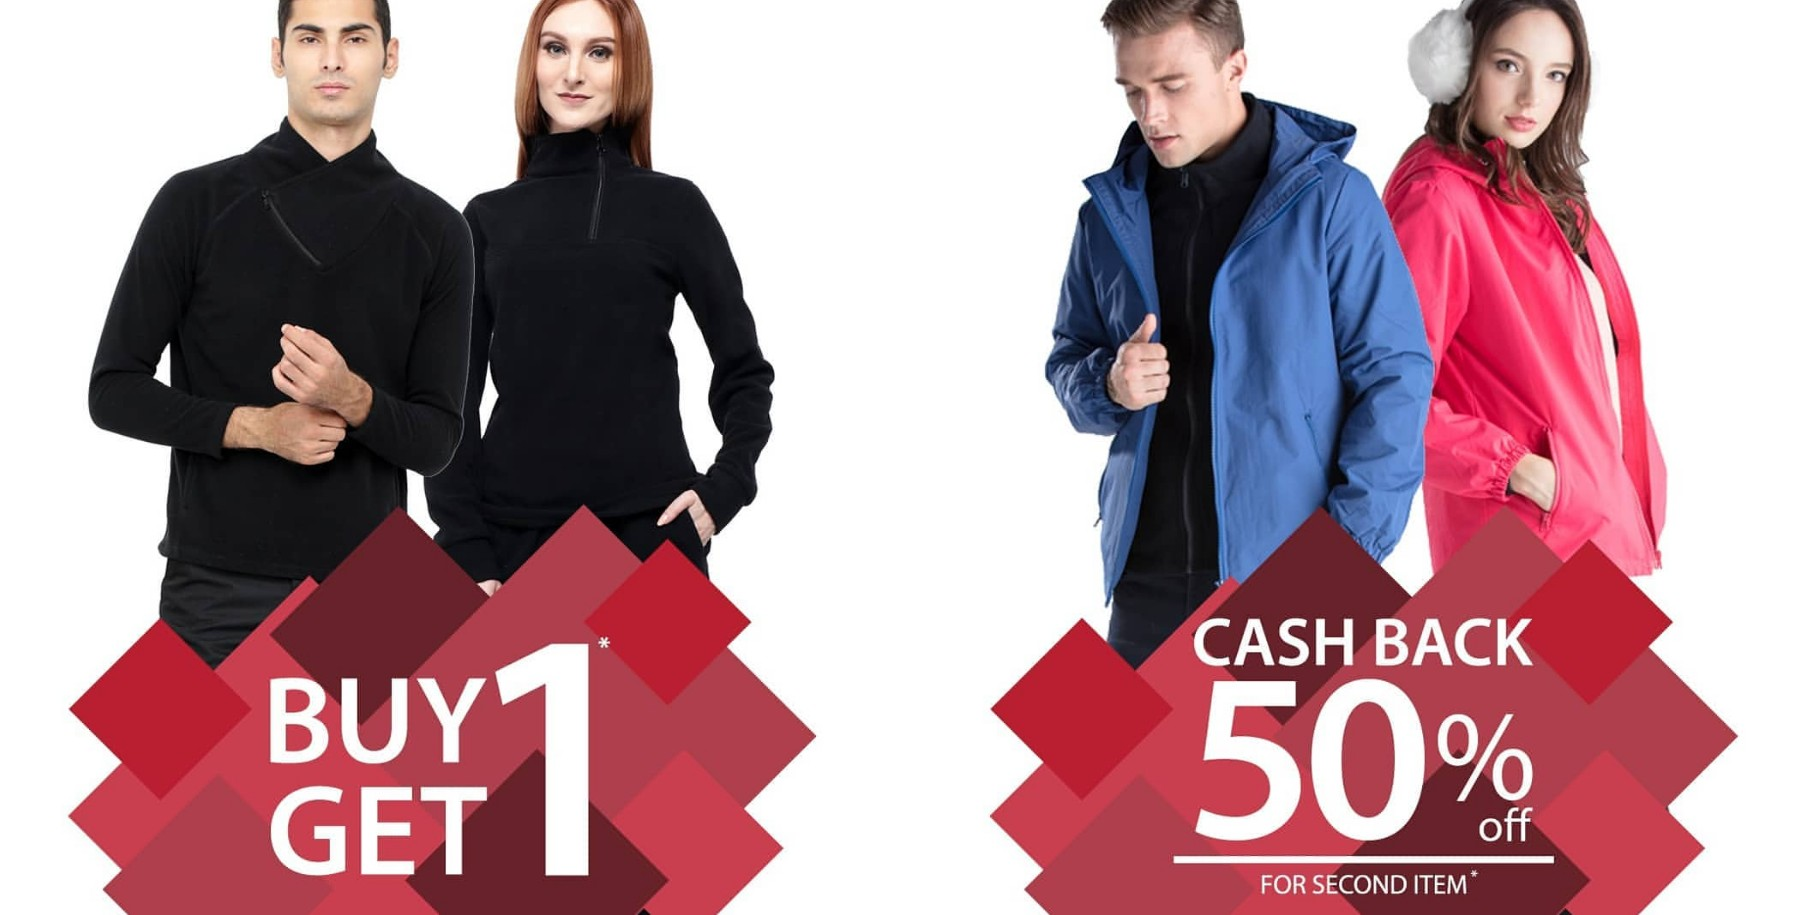 Diskon Coldwear Promo Buy 1 Get 1 dan Cashback sampai 50%